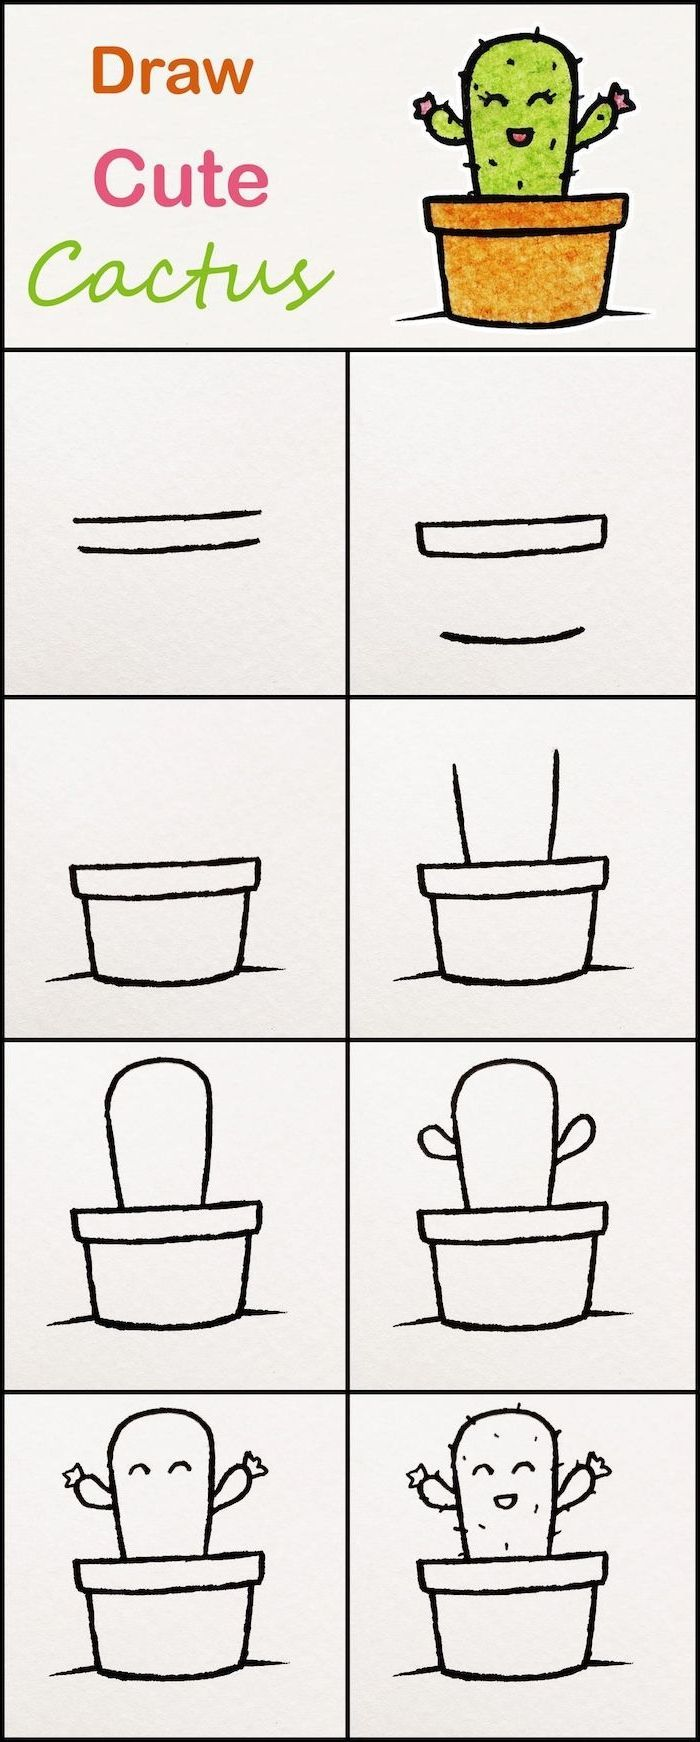 Tuto Dessin Facile A Faire Par Etape Cactus En Pot De Fleur Idee Comment Dessiner Des Kawaii Fac In 2020 Easy Doodles Drawings Drawing Tutorial Easy Cute Easy Drawings